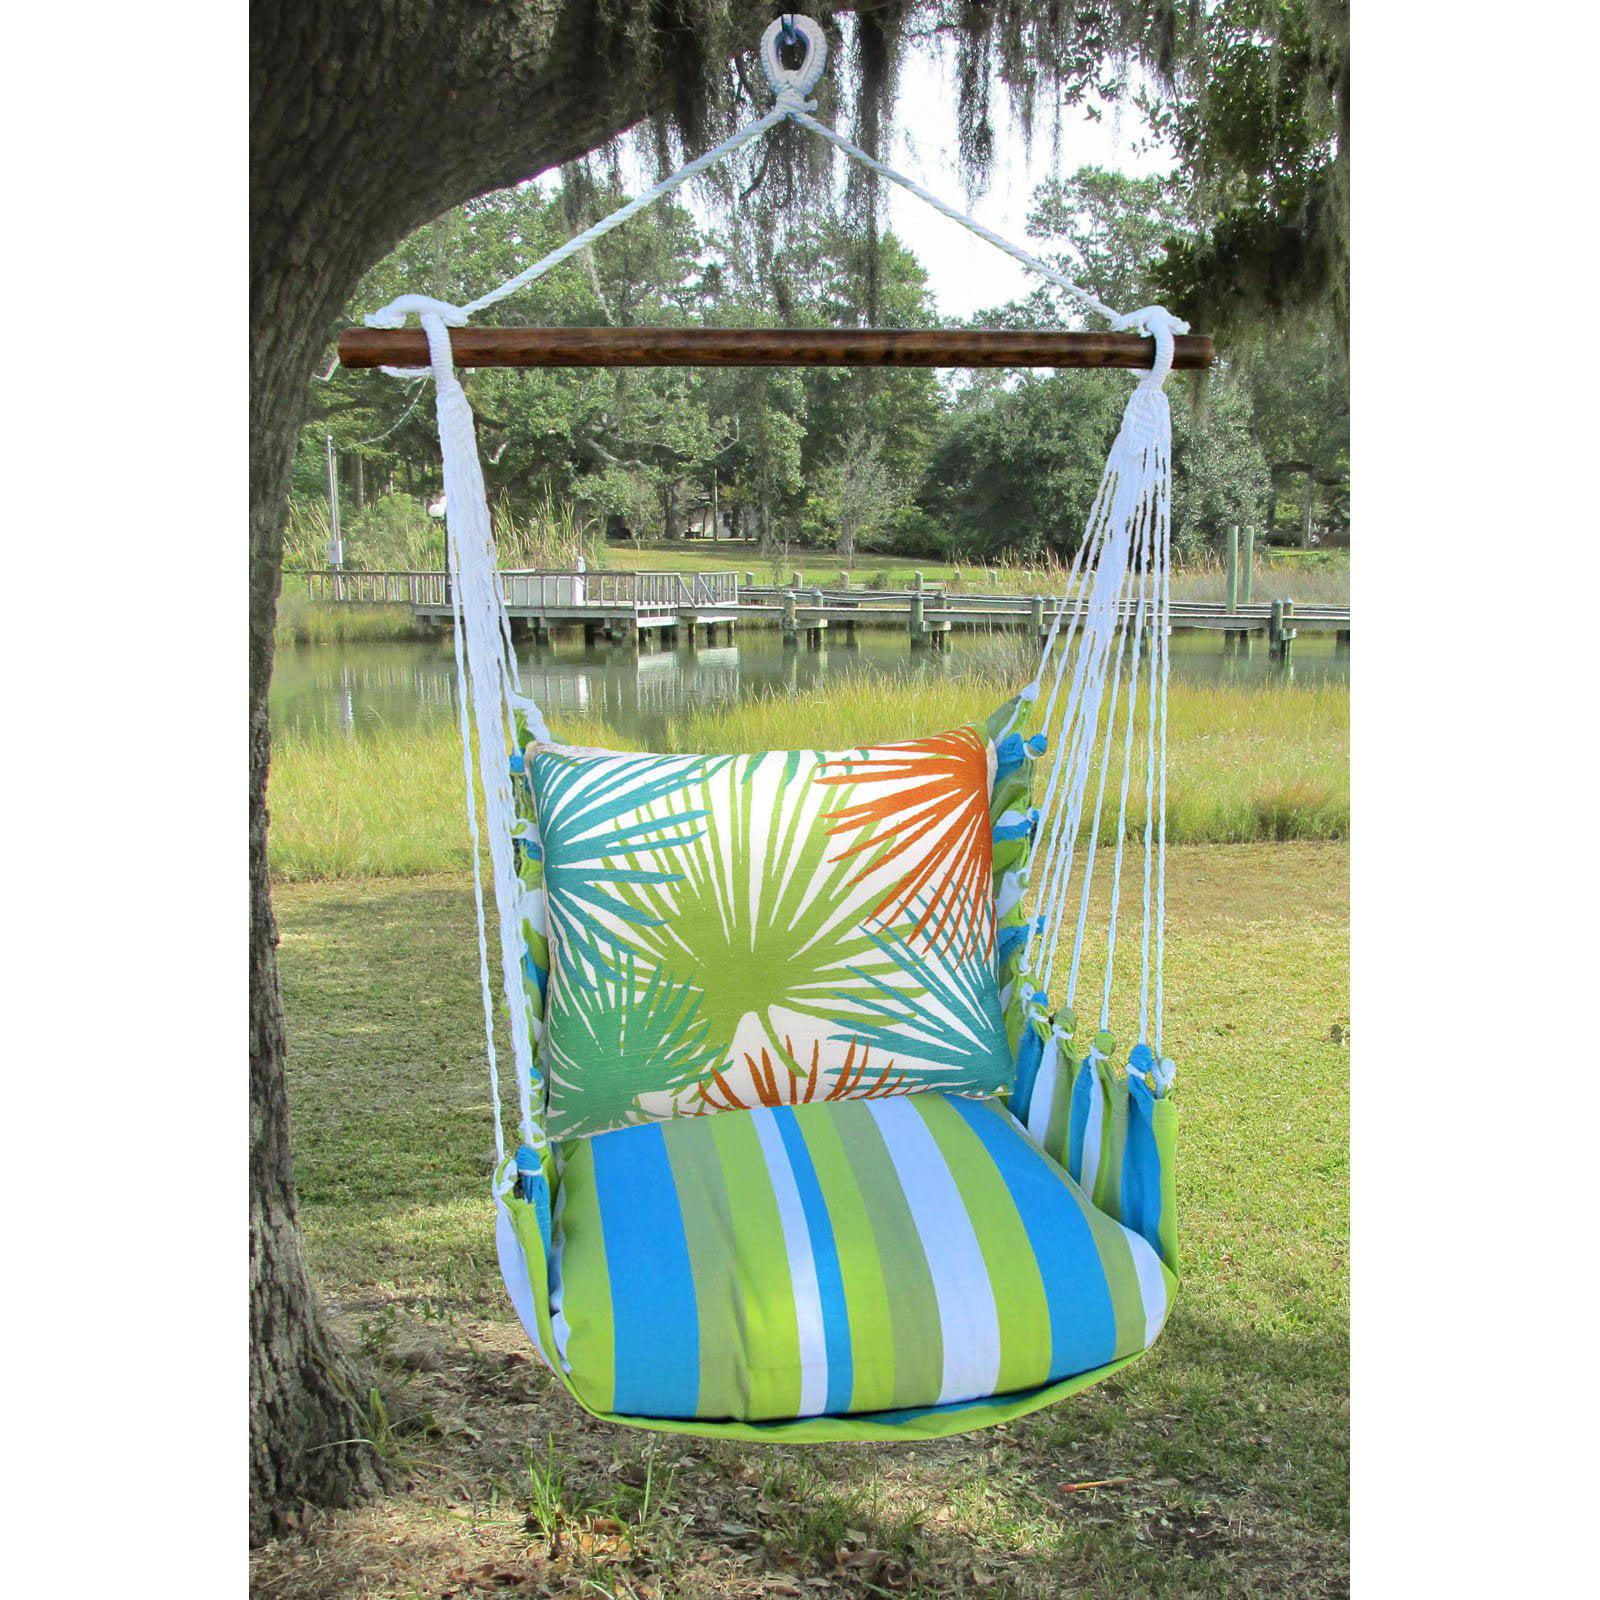 Magnolia Casual Beach Boulevard Outdoor Hammock Chair Set with Pillow